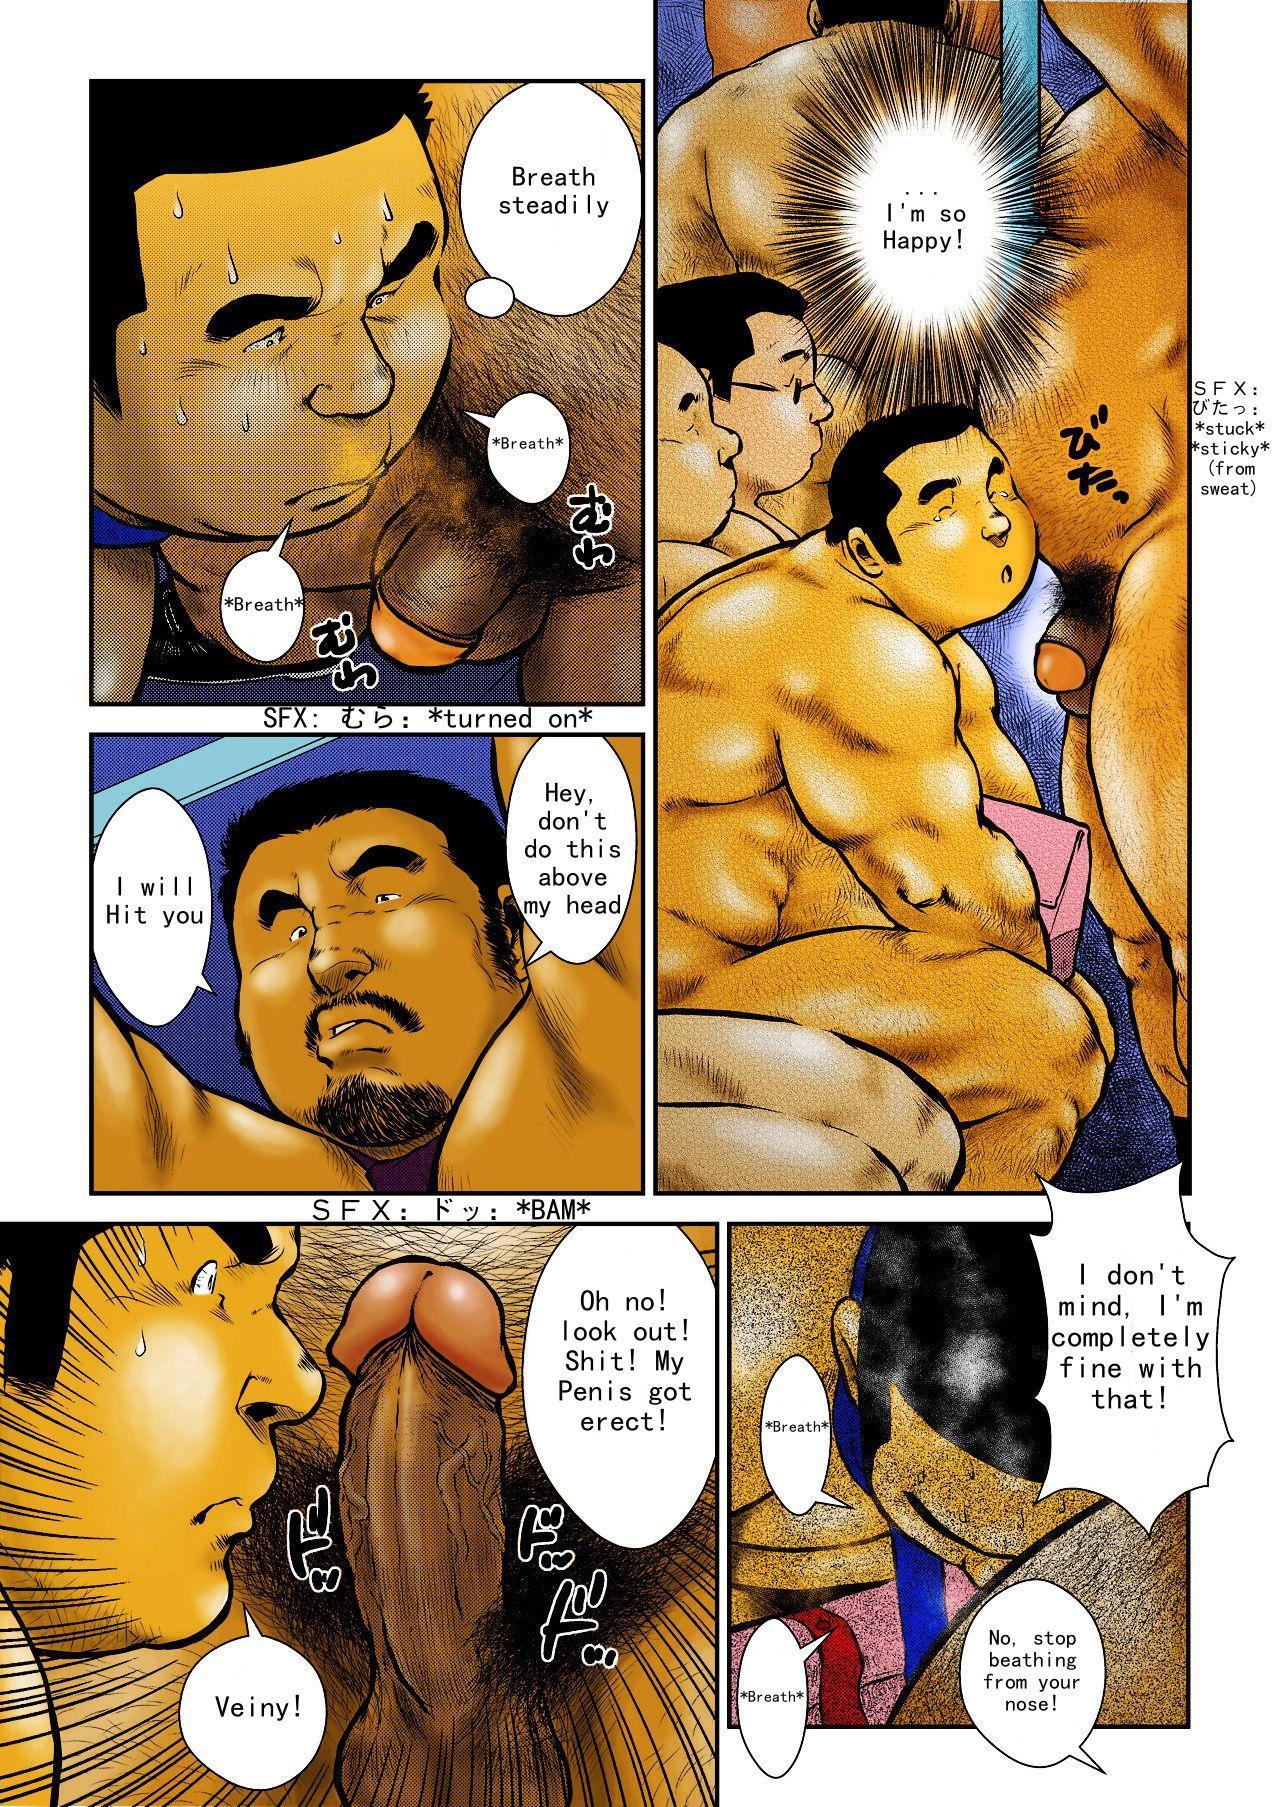 Honjitsu wa Zenra Day | Today is Naked Day 8